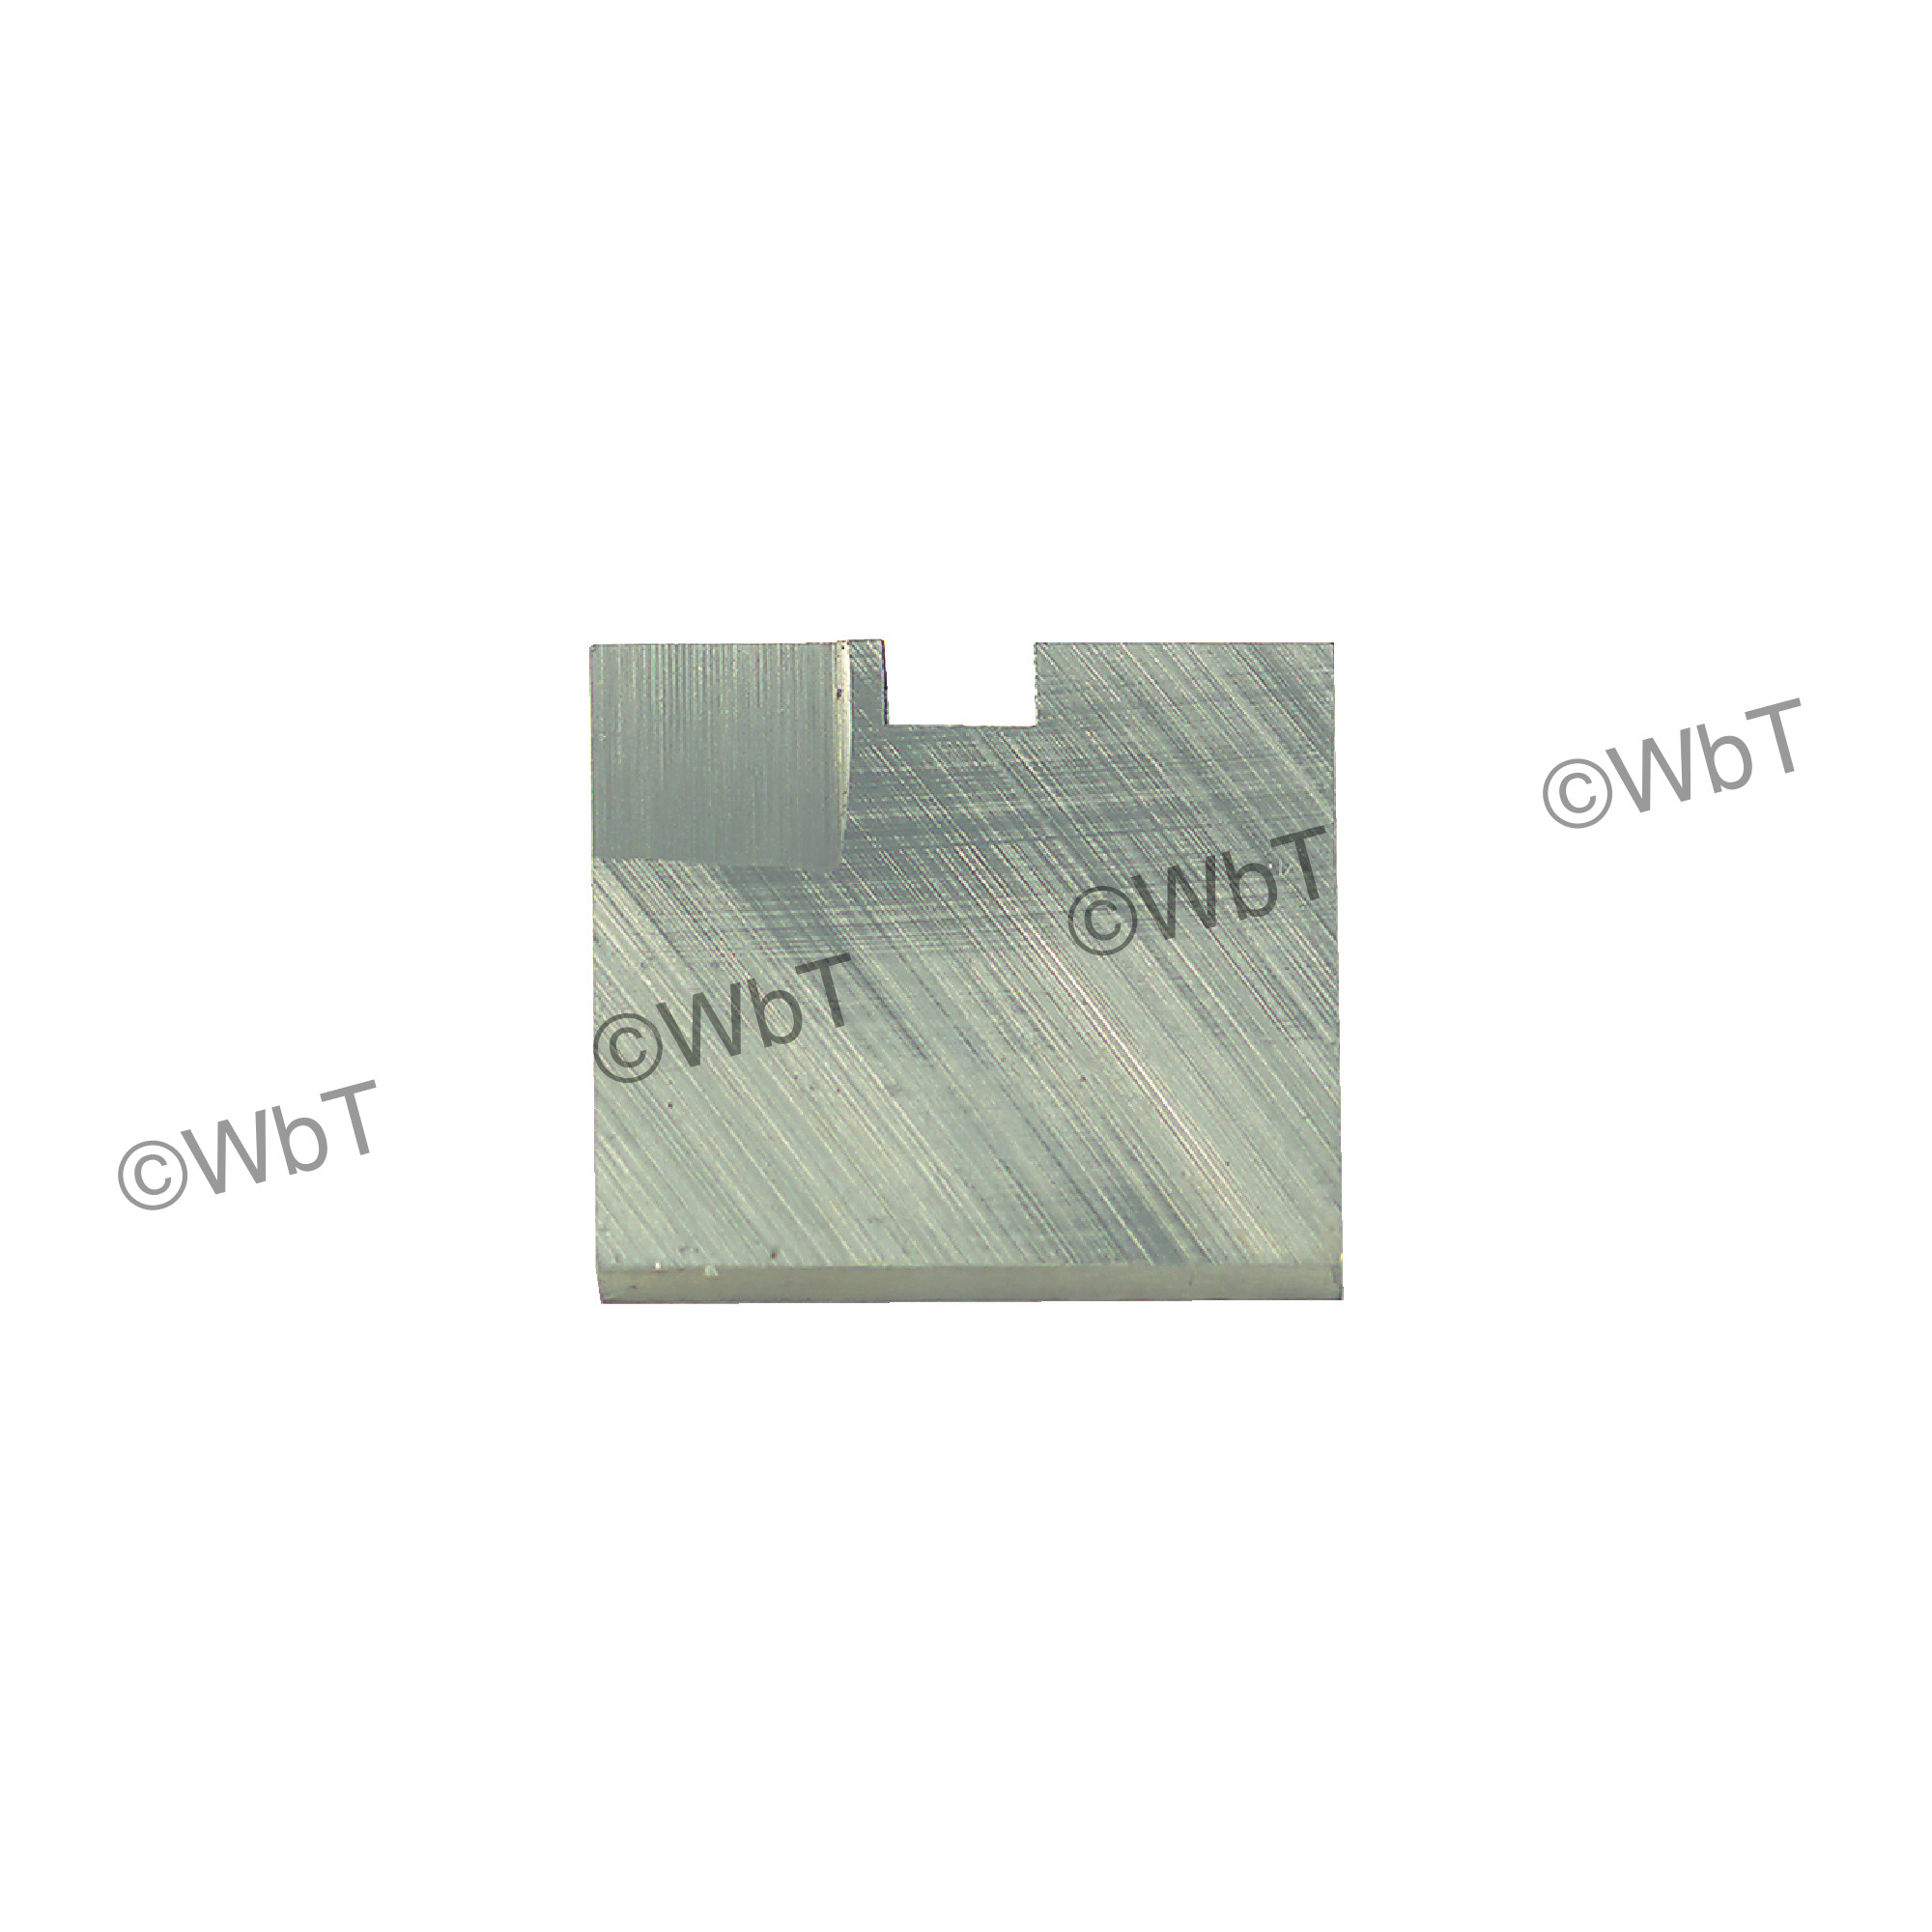 Forward blade for MULTI-TOOL High Speed Steel Backfacer Socket Head Cap Screw Counterbore